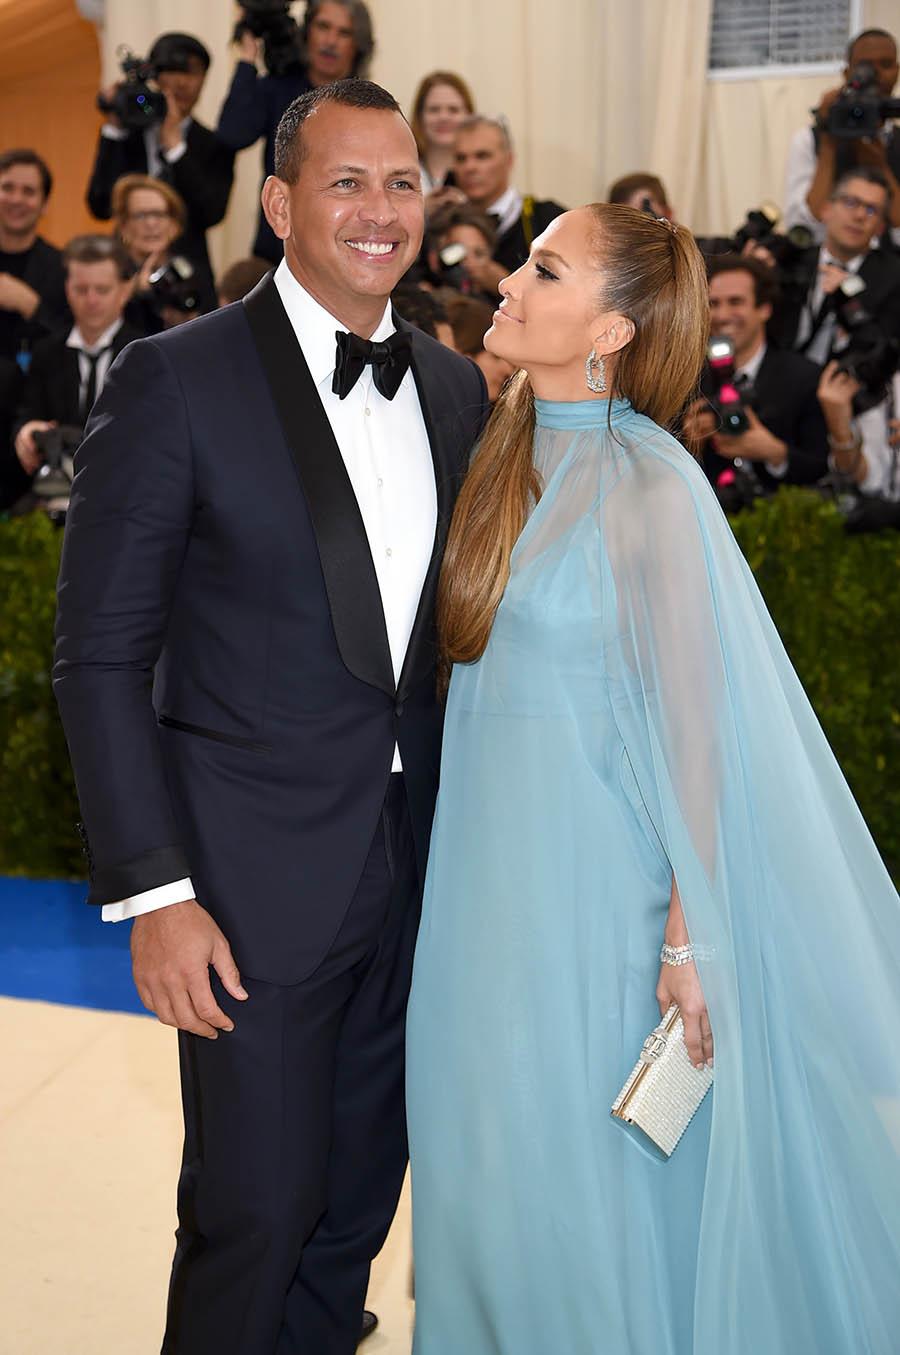 Best Dressed Couple: Sean Combs & Cassie Ventura at 2017 Met